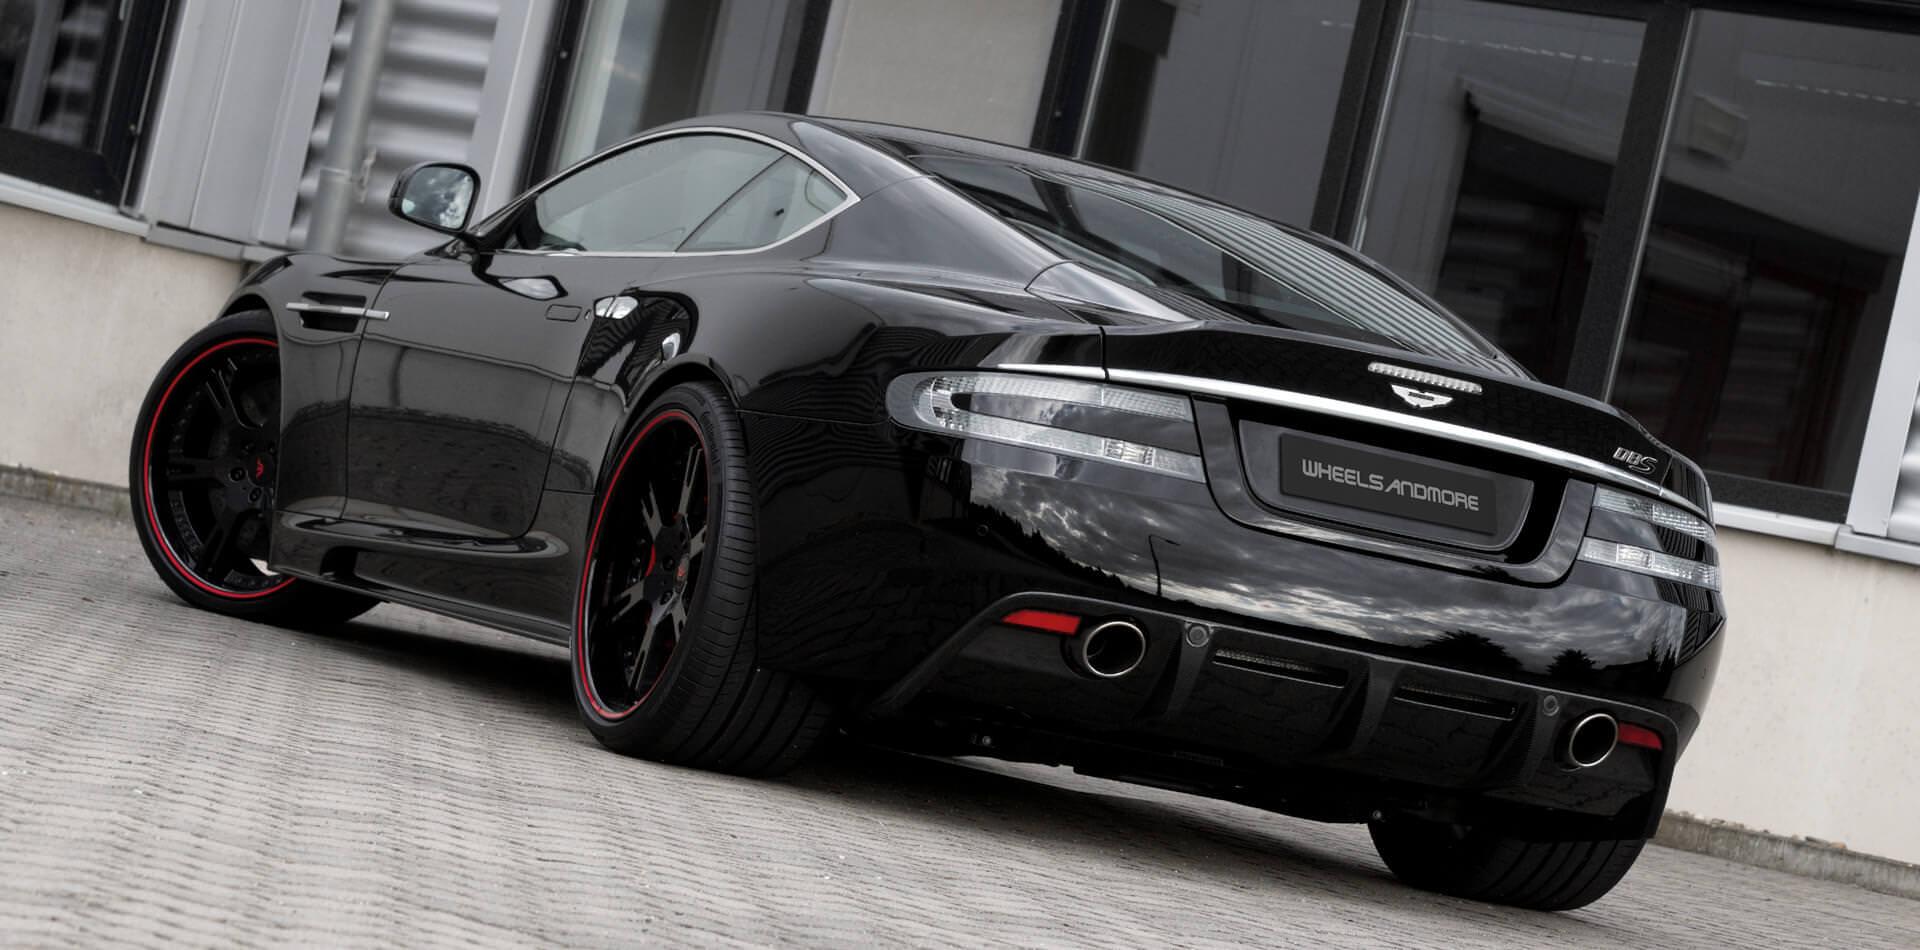 Aston Martin Db9 Dbs Felgen In 20 Zoll Und 21 Zoll Modell 6sporz